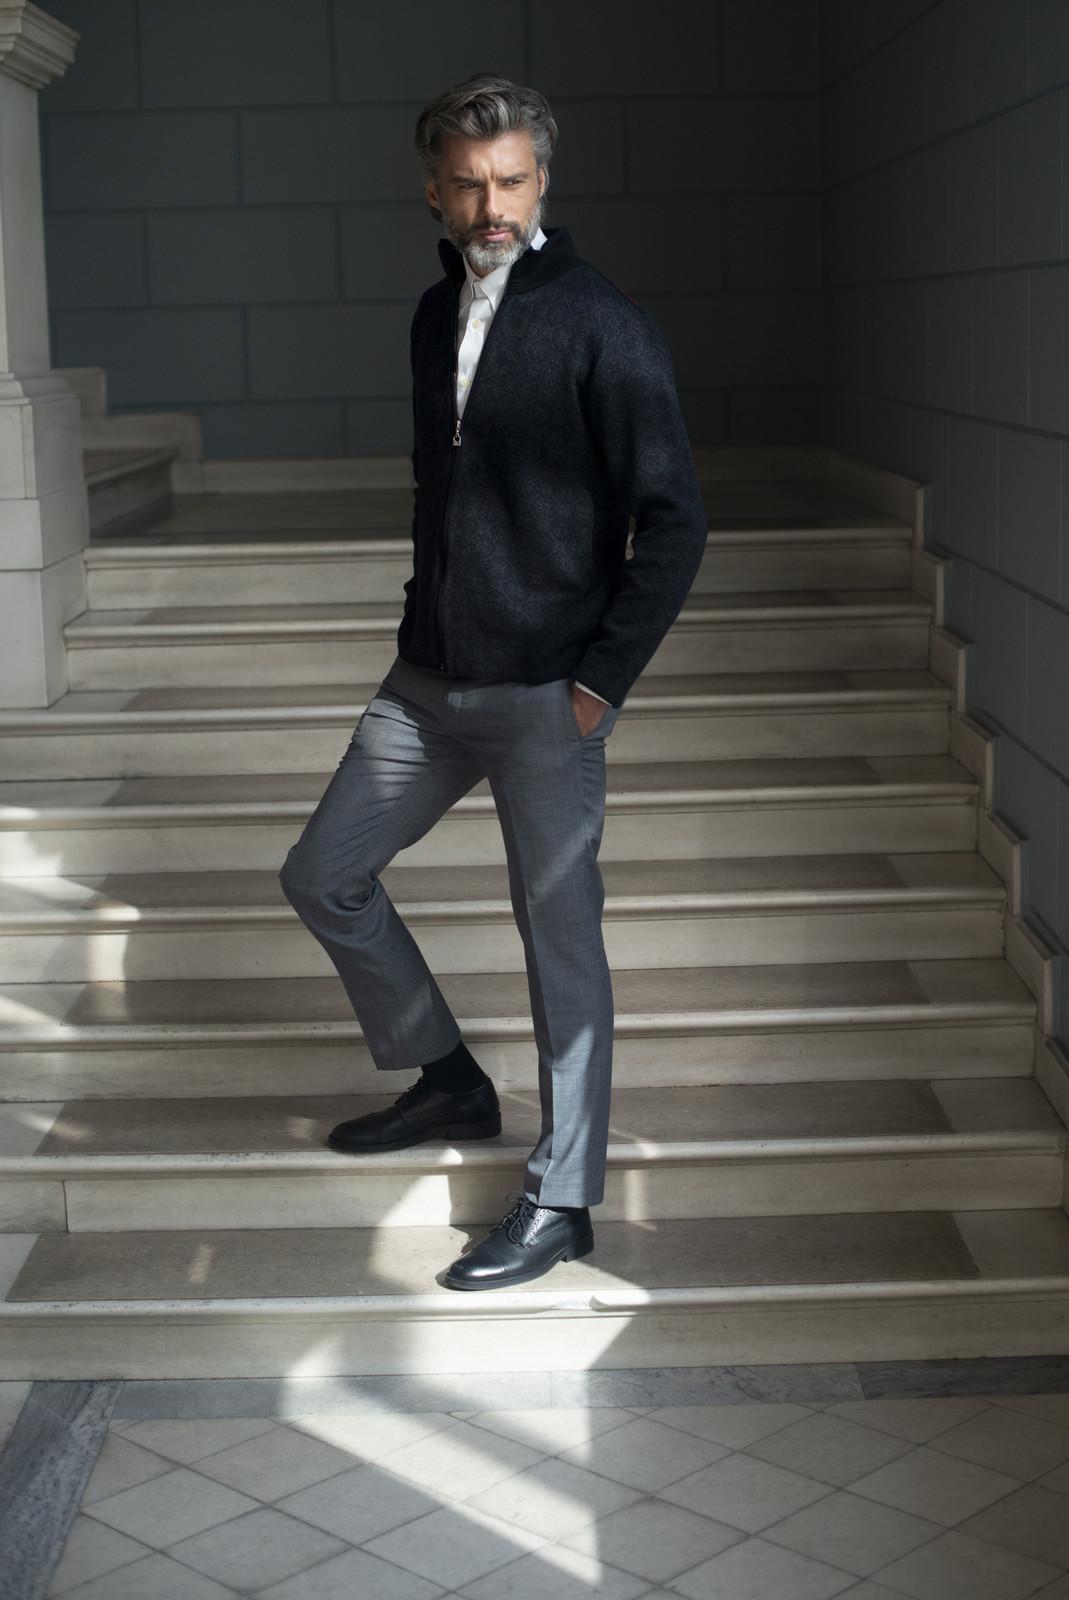 Man wearing Dale of Norway Christoffer Cardigan, Mens - Black/Dark Charcoal/Raspberry - 83471-F